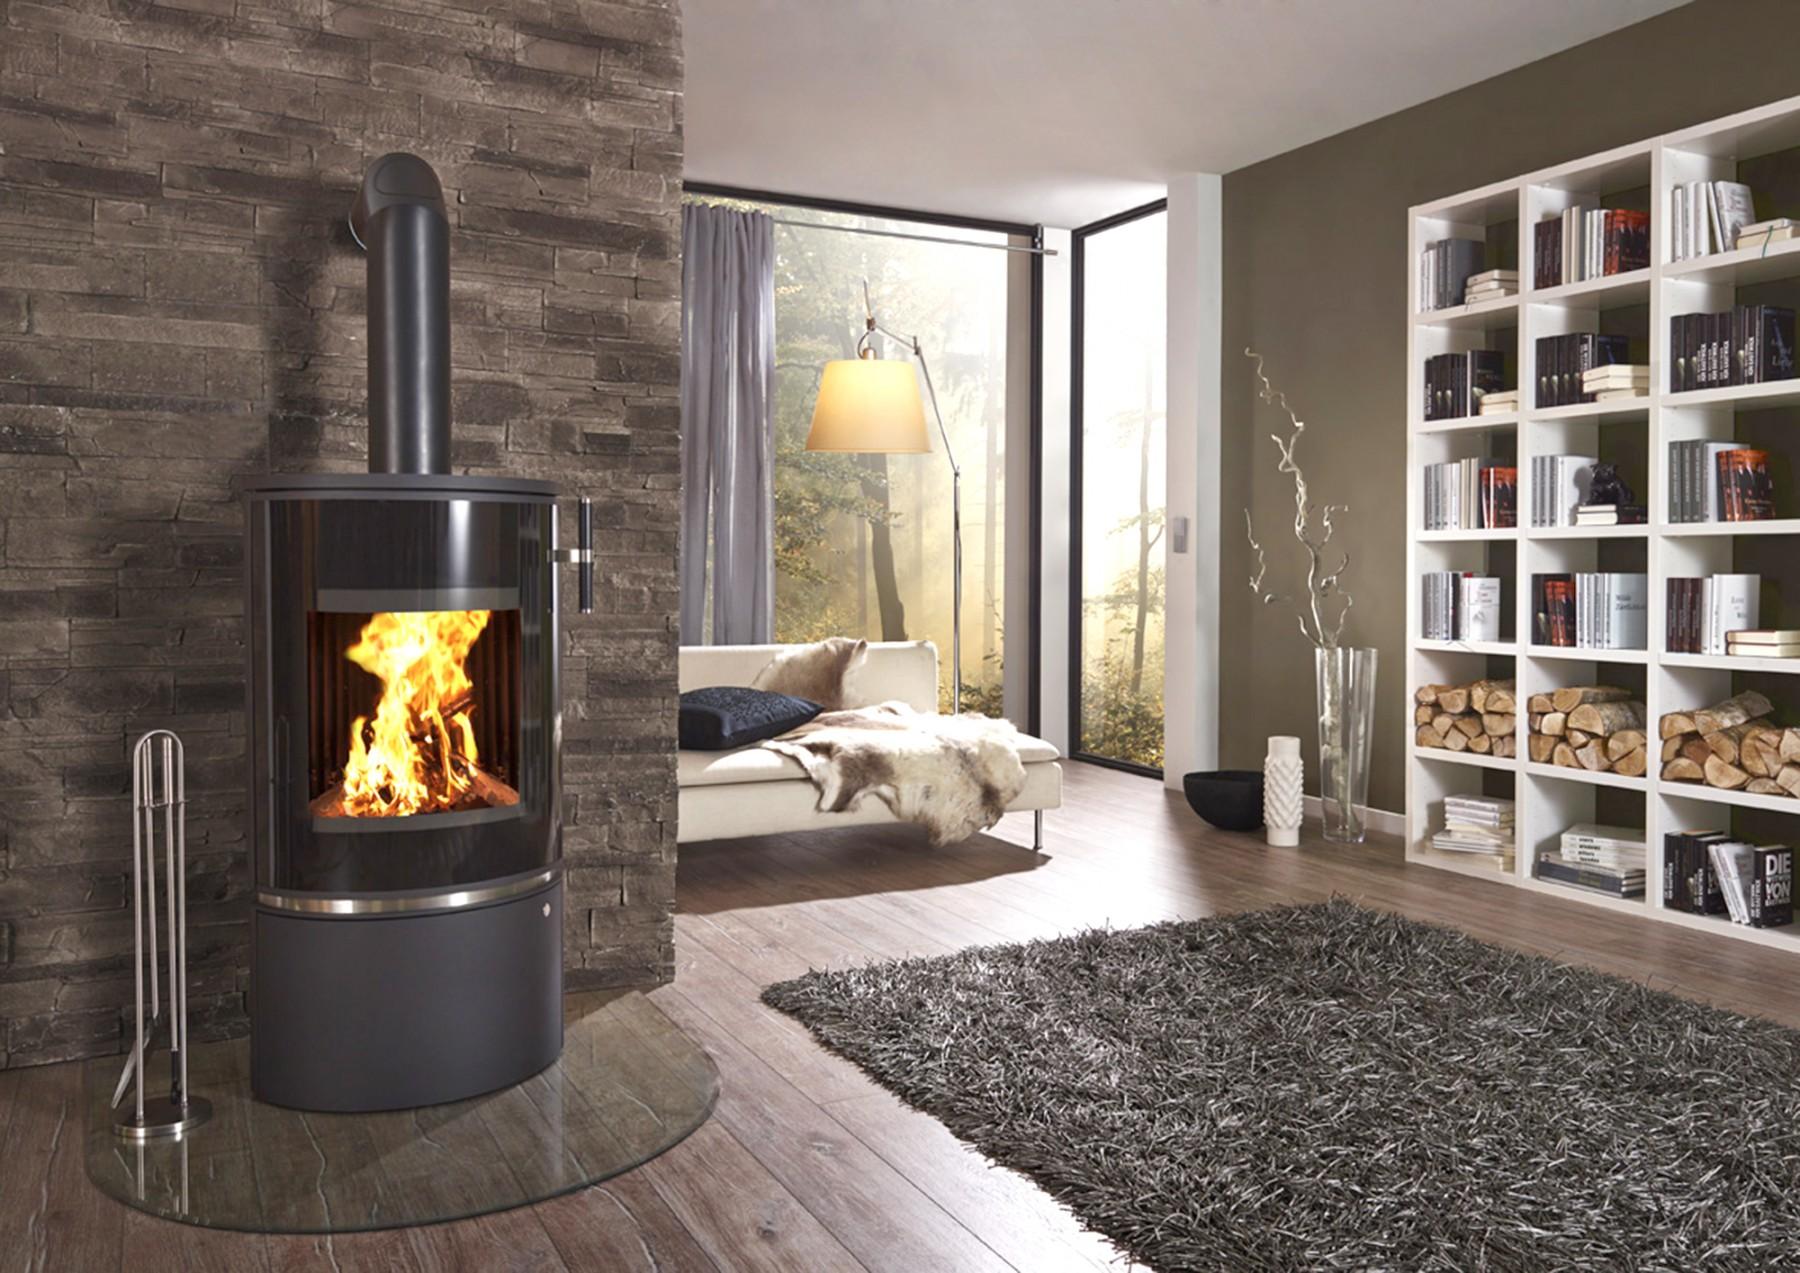 cera scusi plus kaminofen feuerland kiel. Black Bedroom Furniture Sets. Home Design Ideas